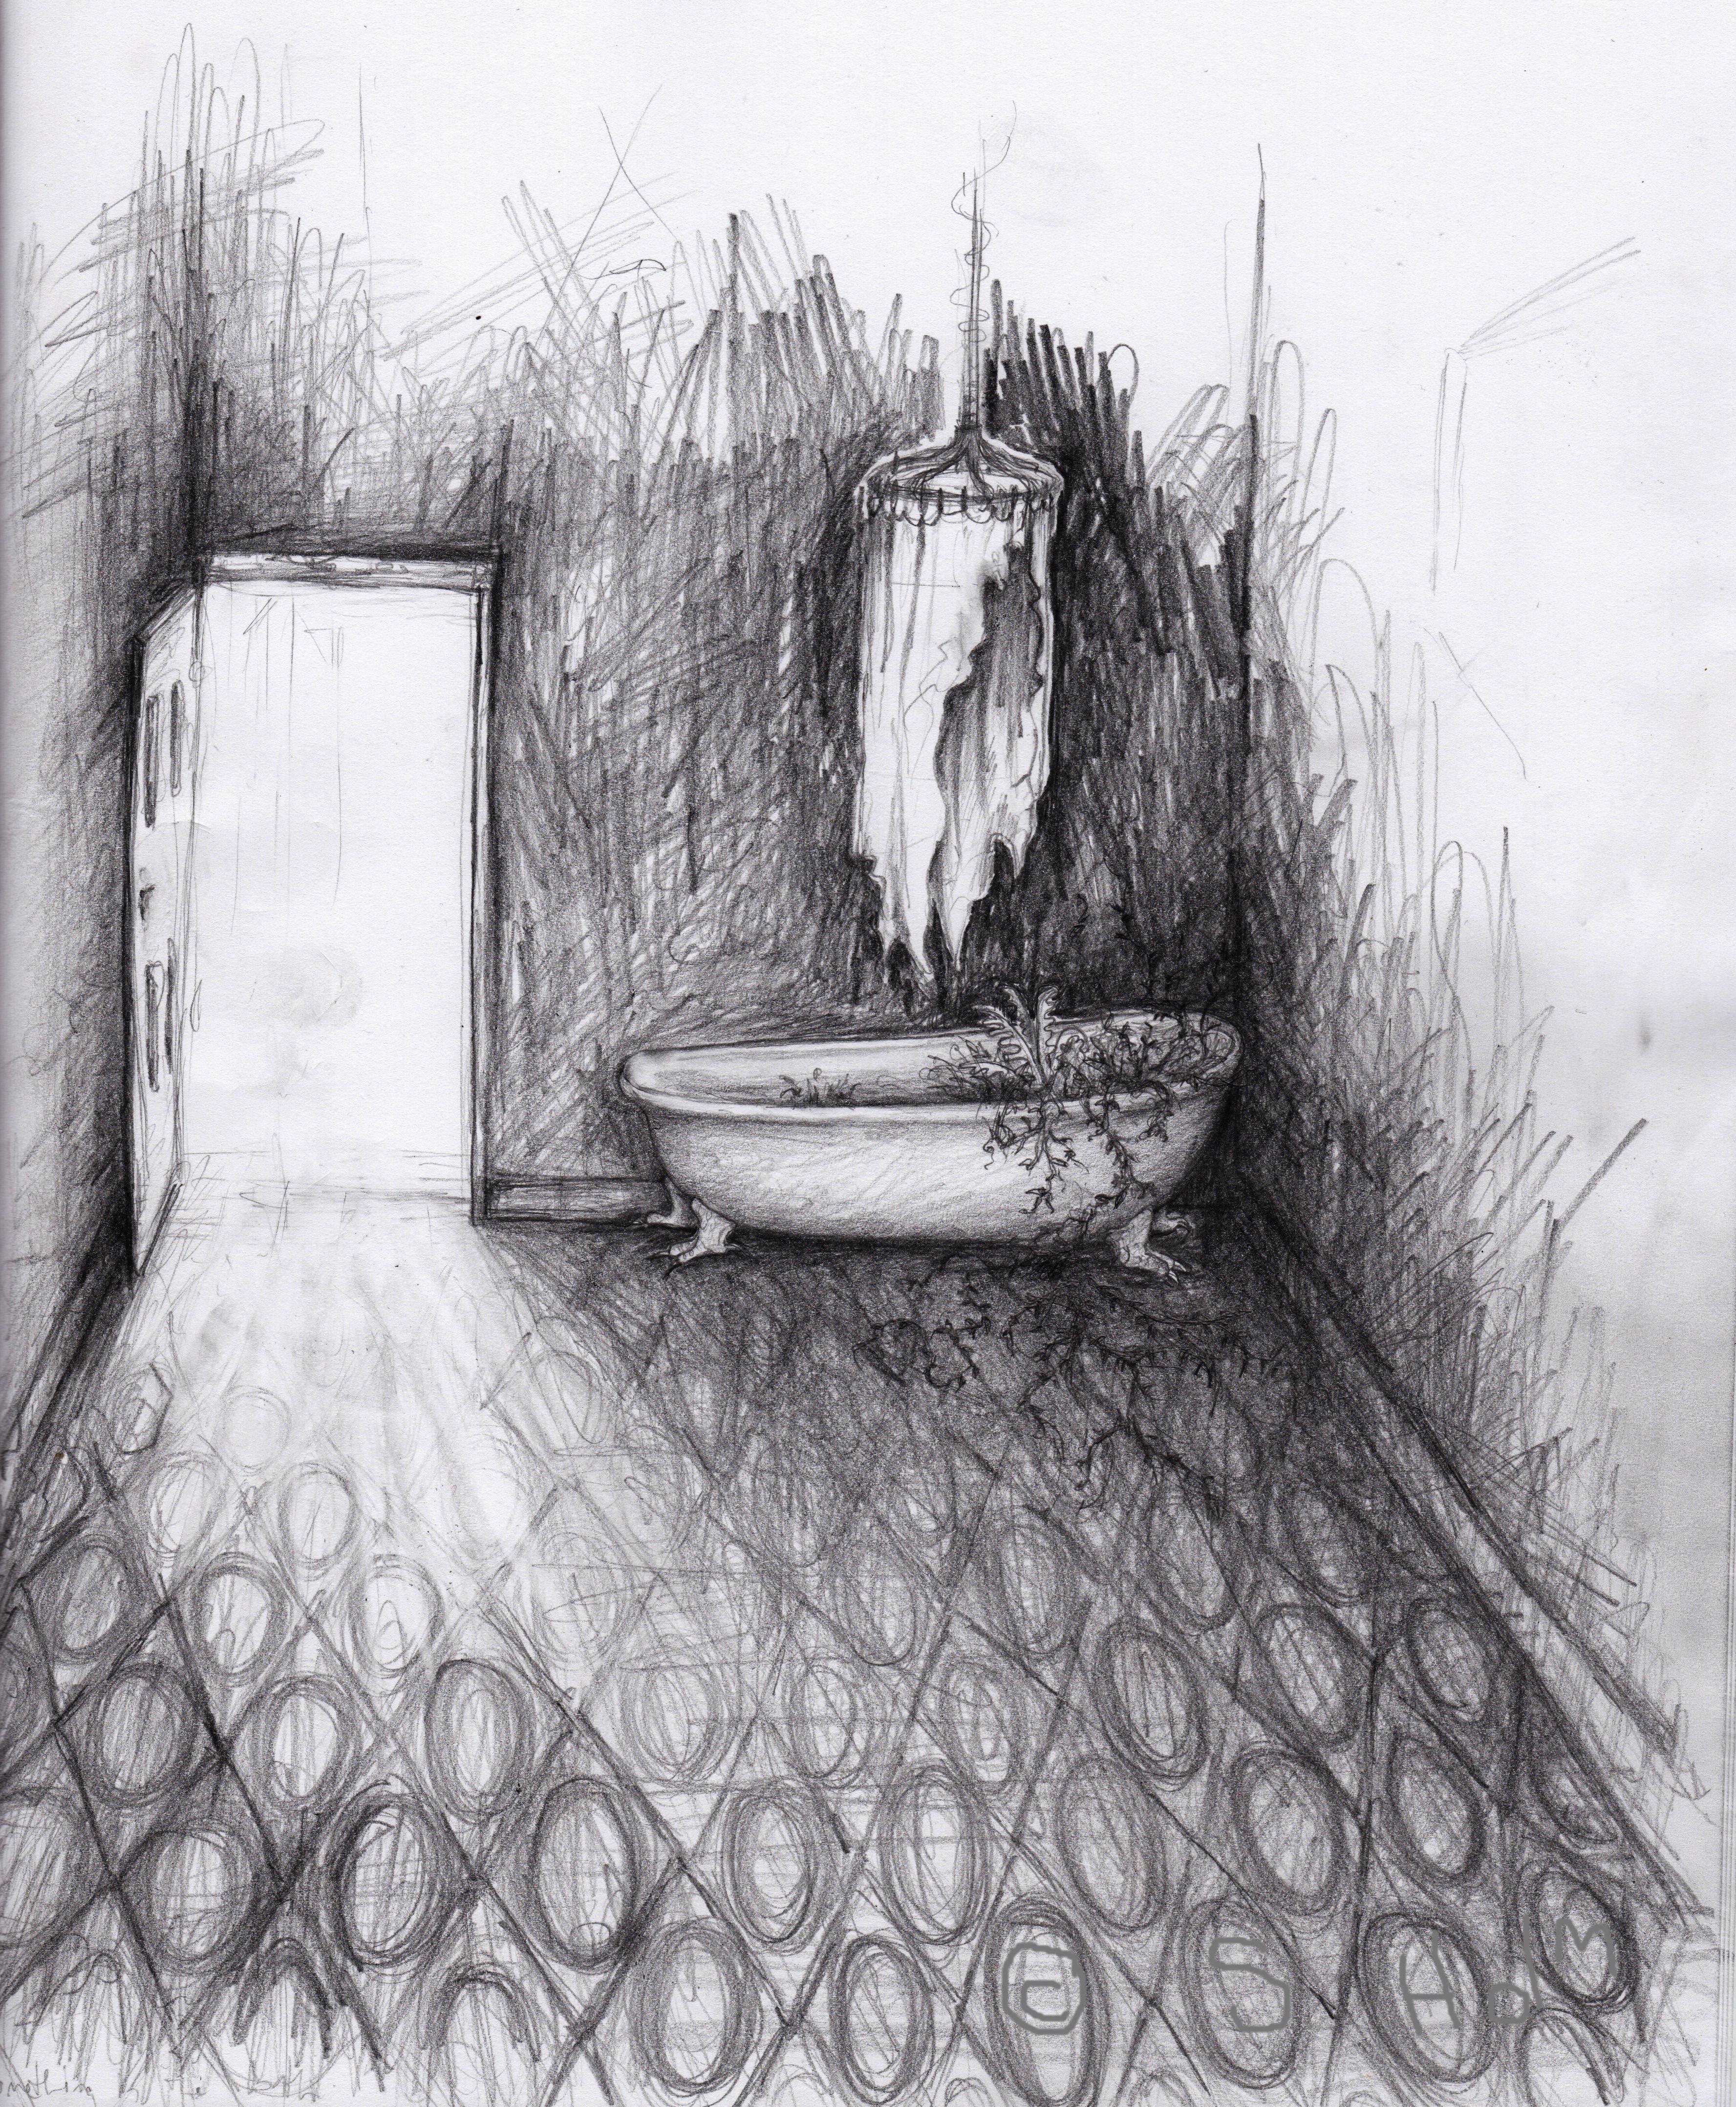 Creepy bath